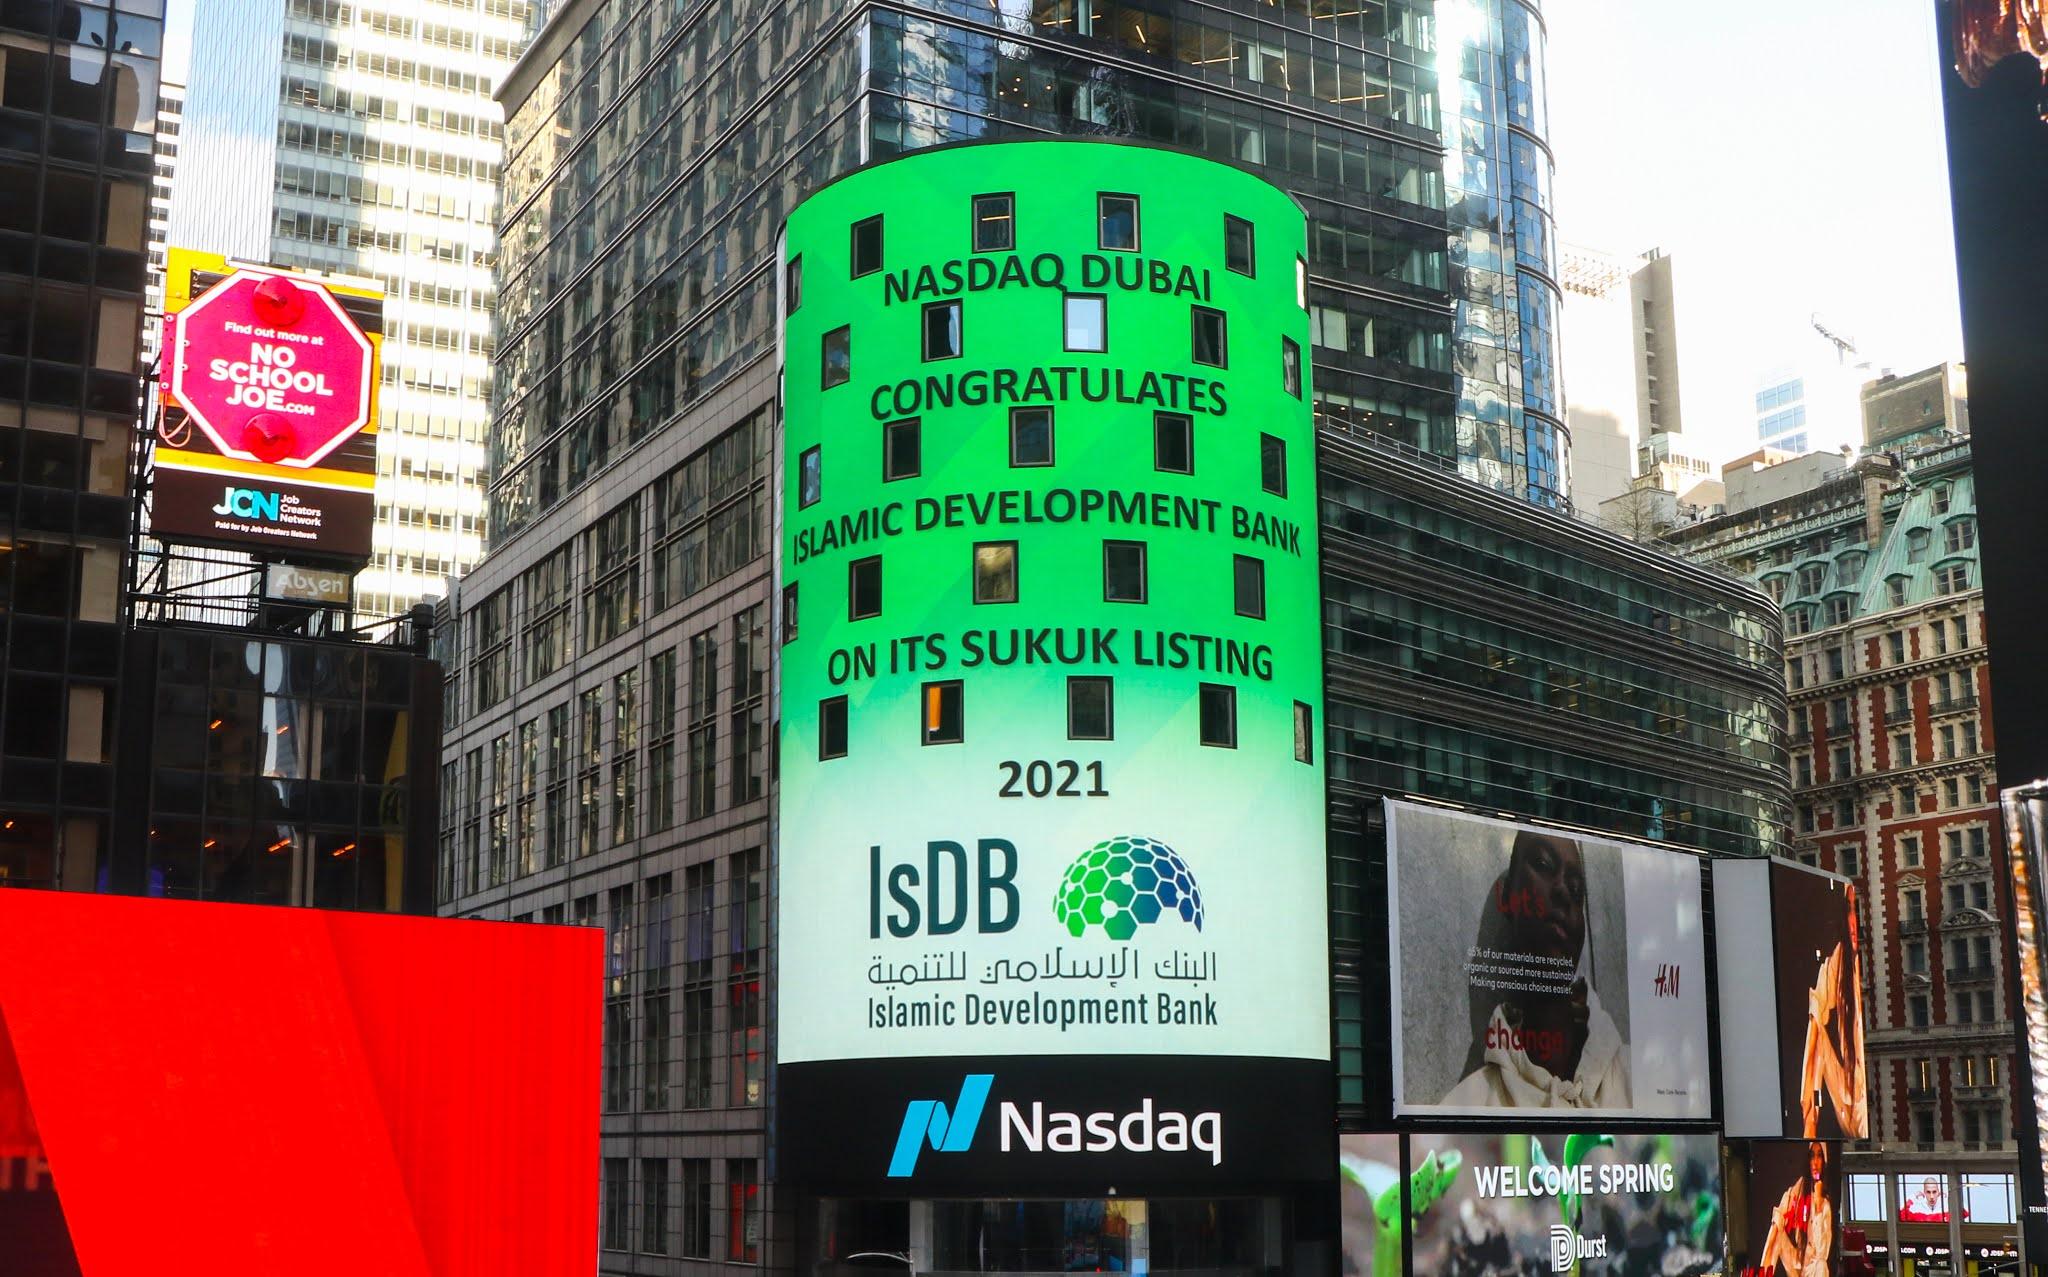 Nasdaq Dubai welcomes listing of $2.5 billion Sukuk by IsDB